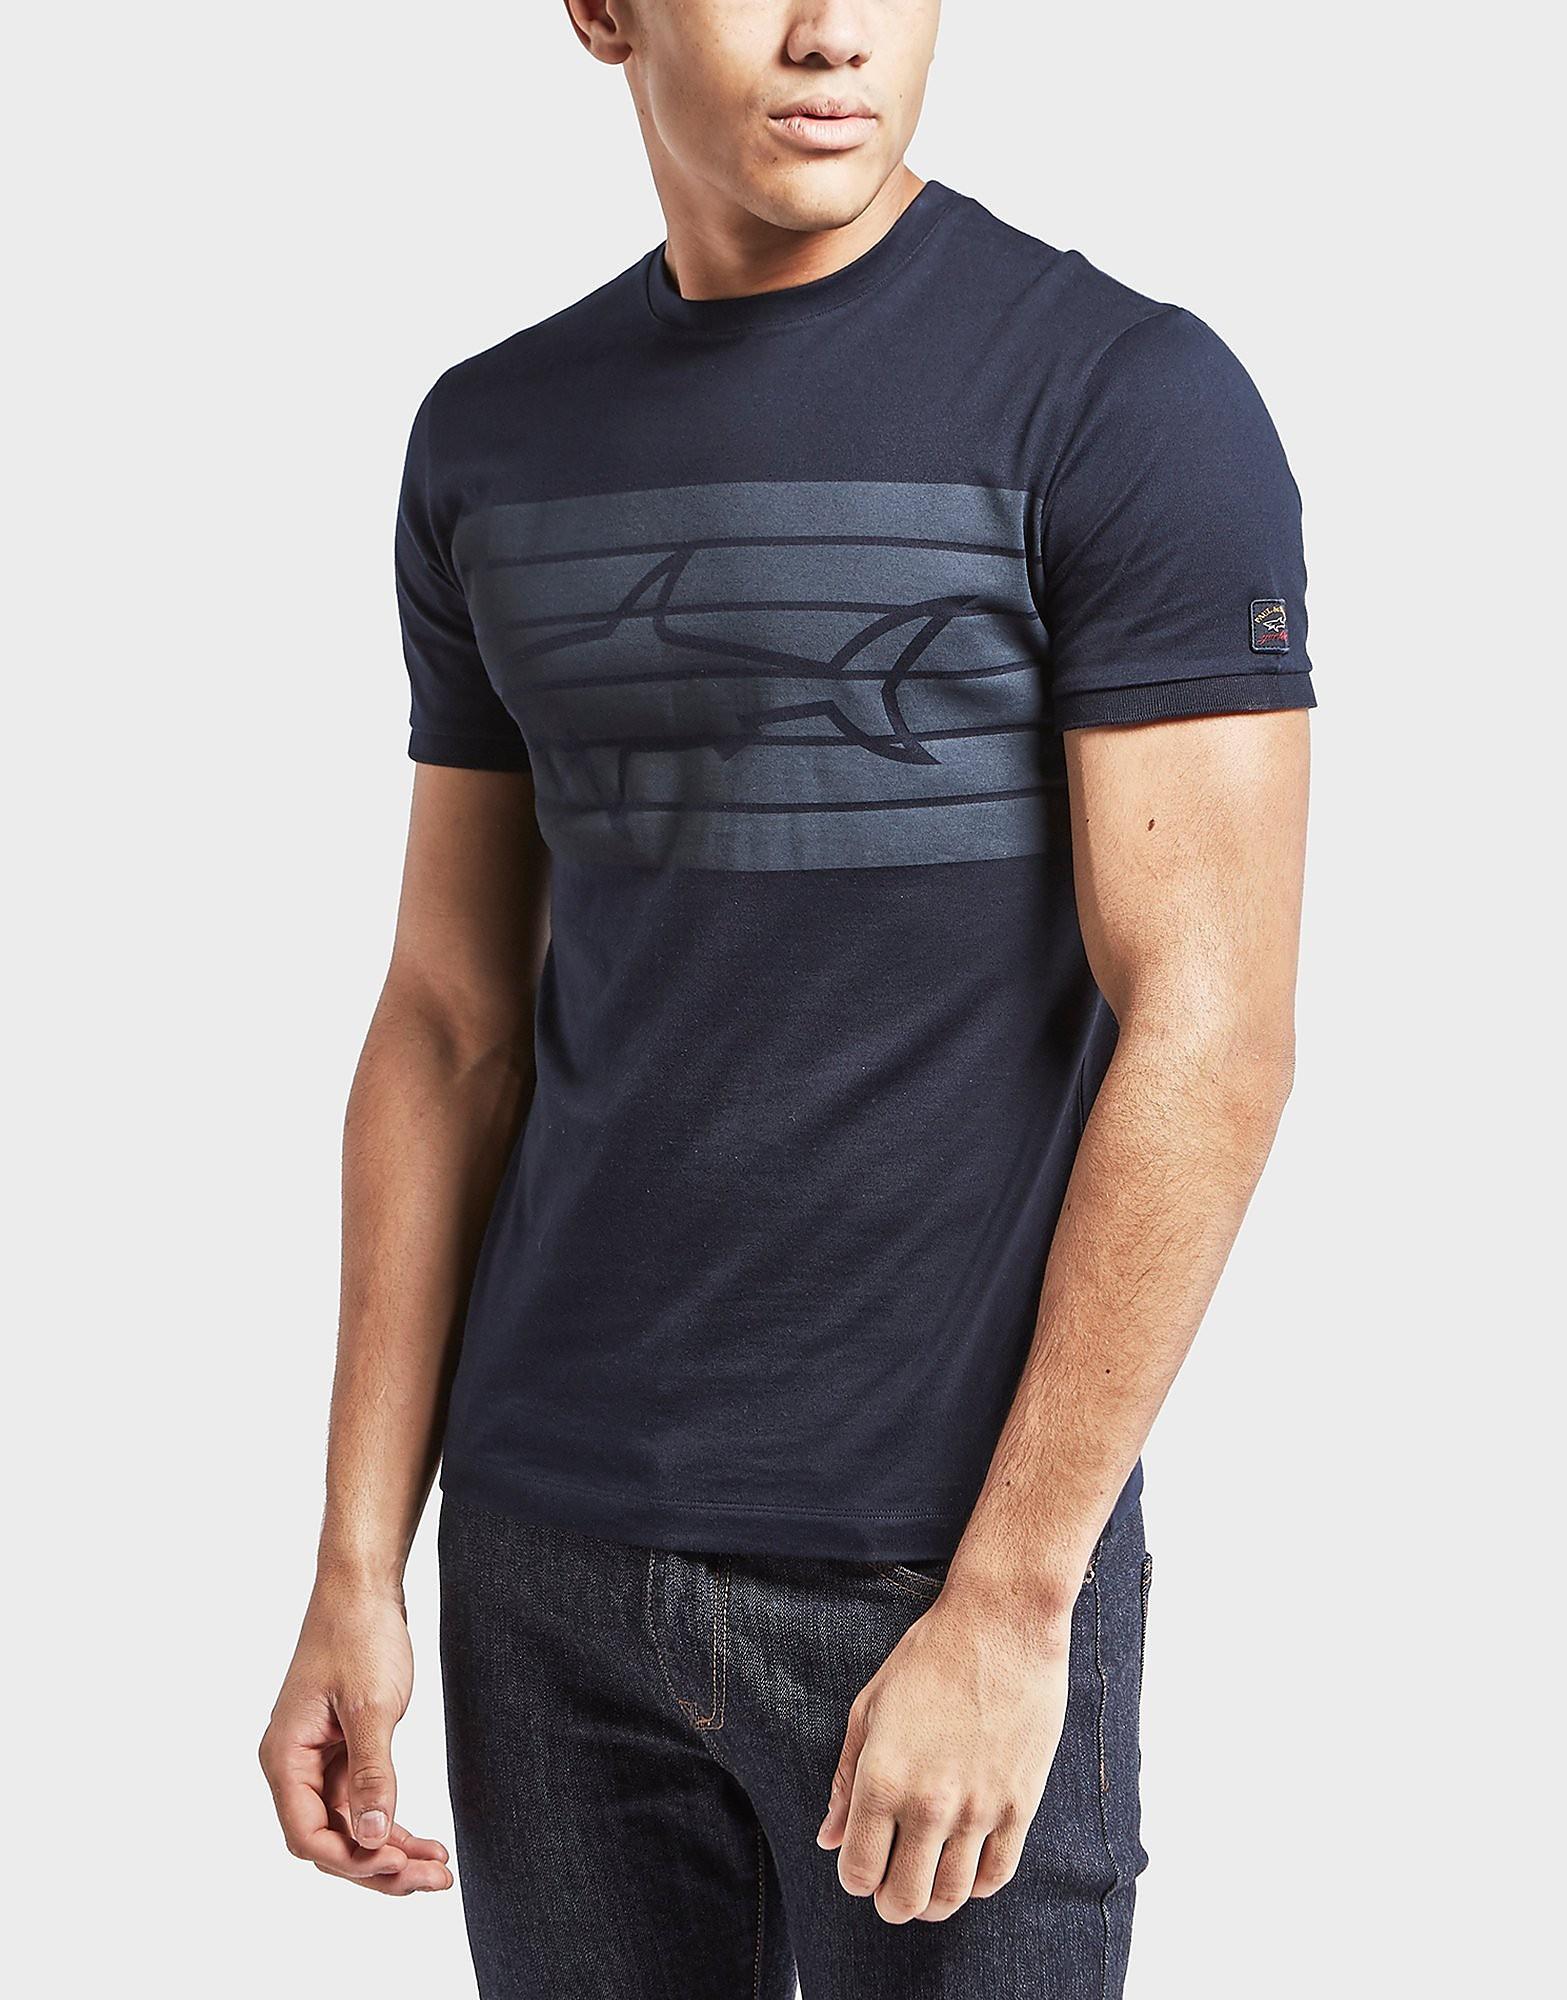 Paul and Shark Short Sleeve Shark T-Shirt